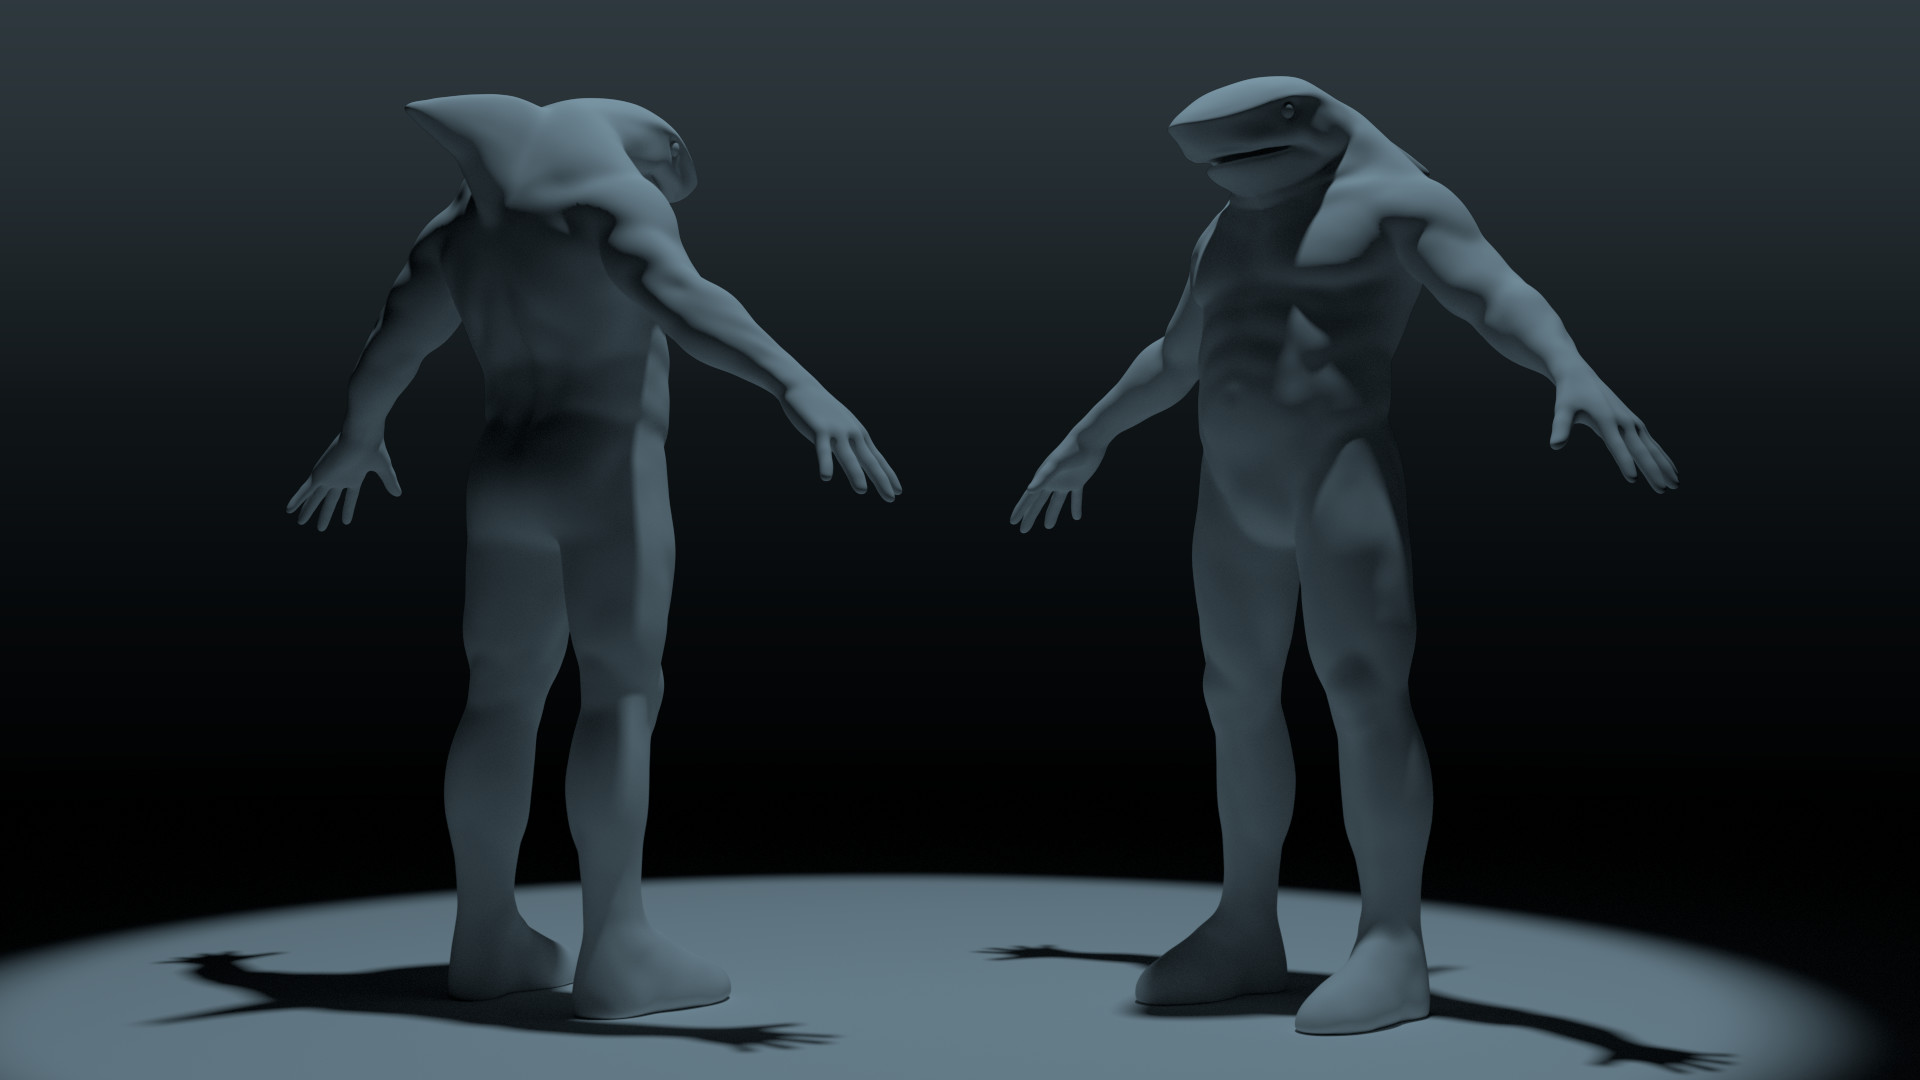 Andre bengtsson sharkmanwip2